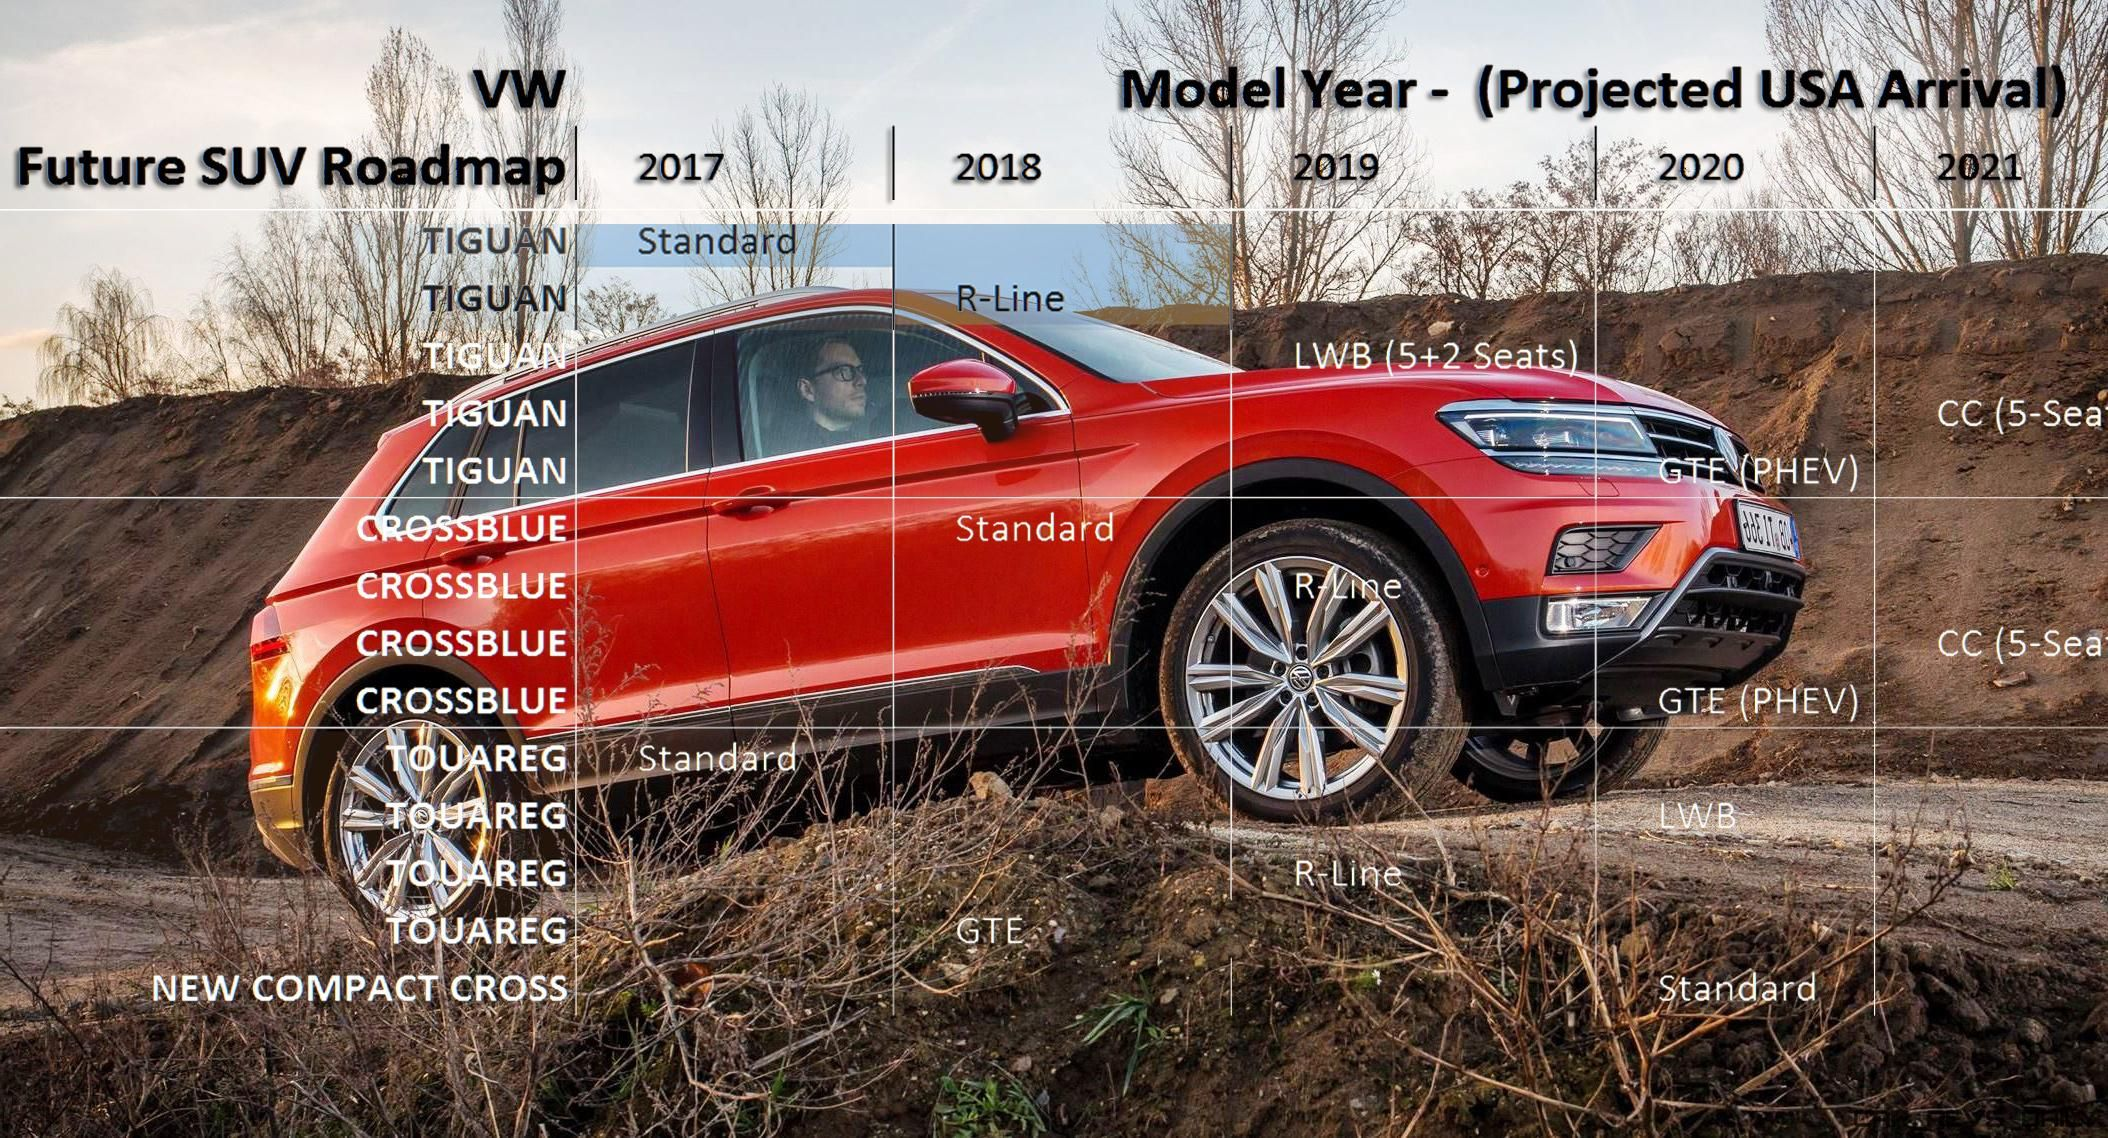 future vw usa suv roadmap projects 15 variants2021